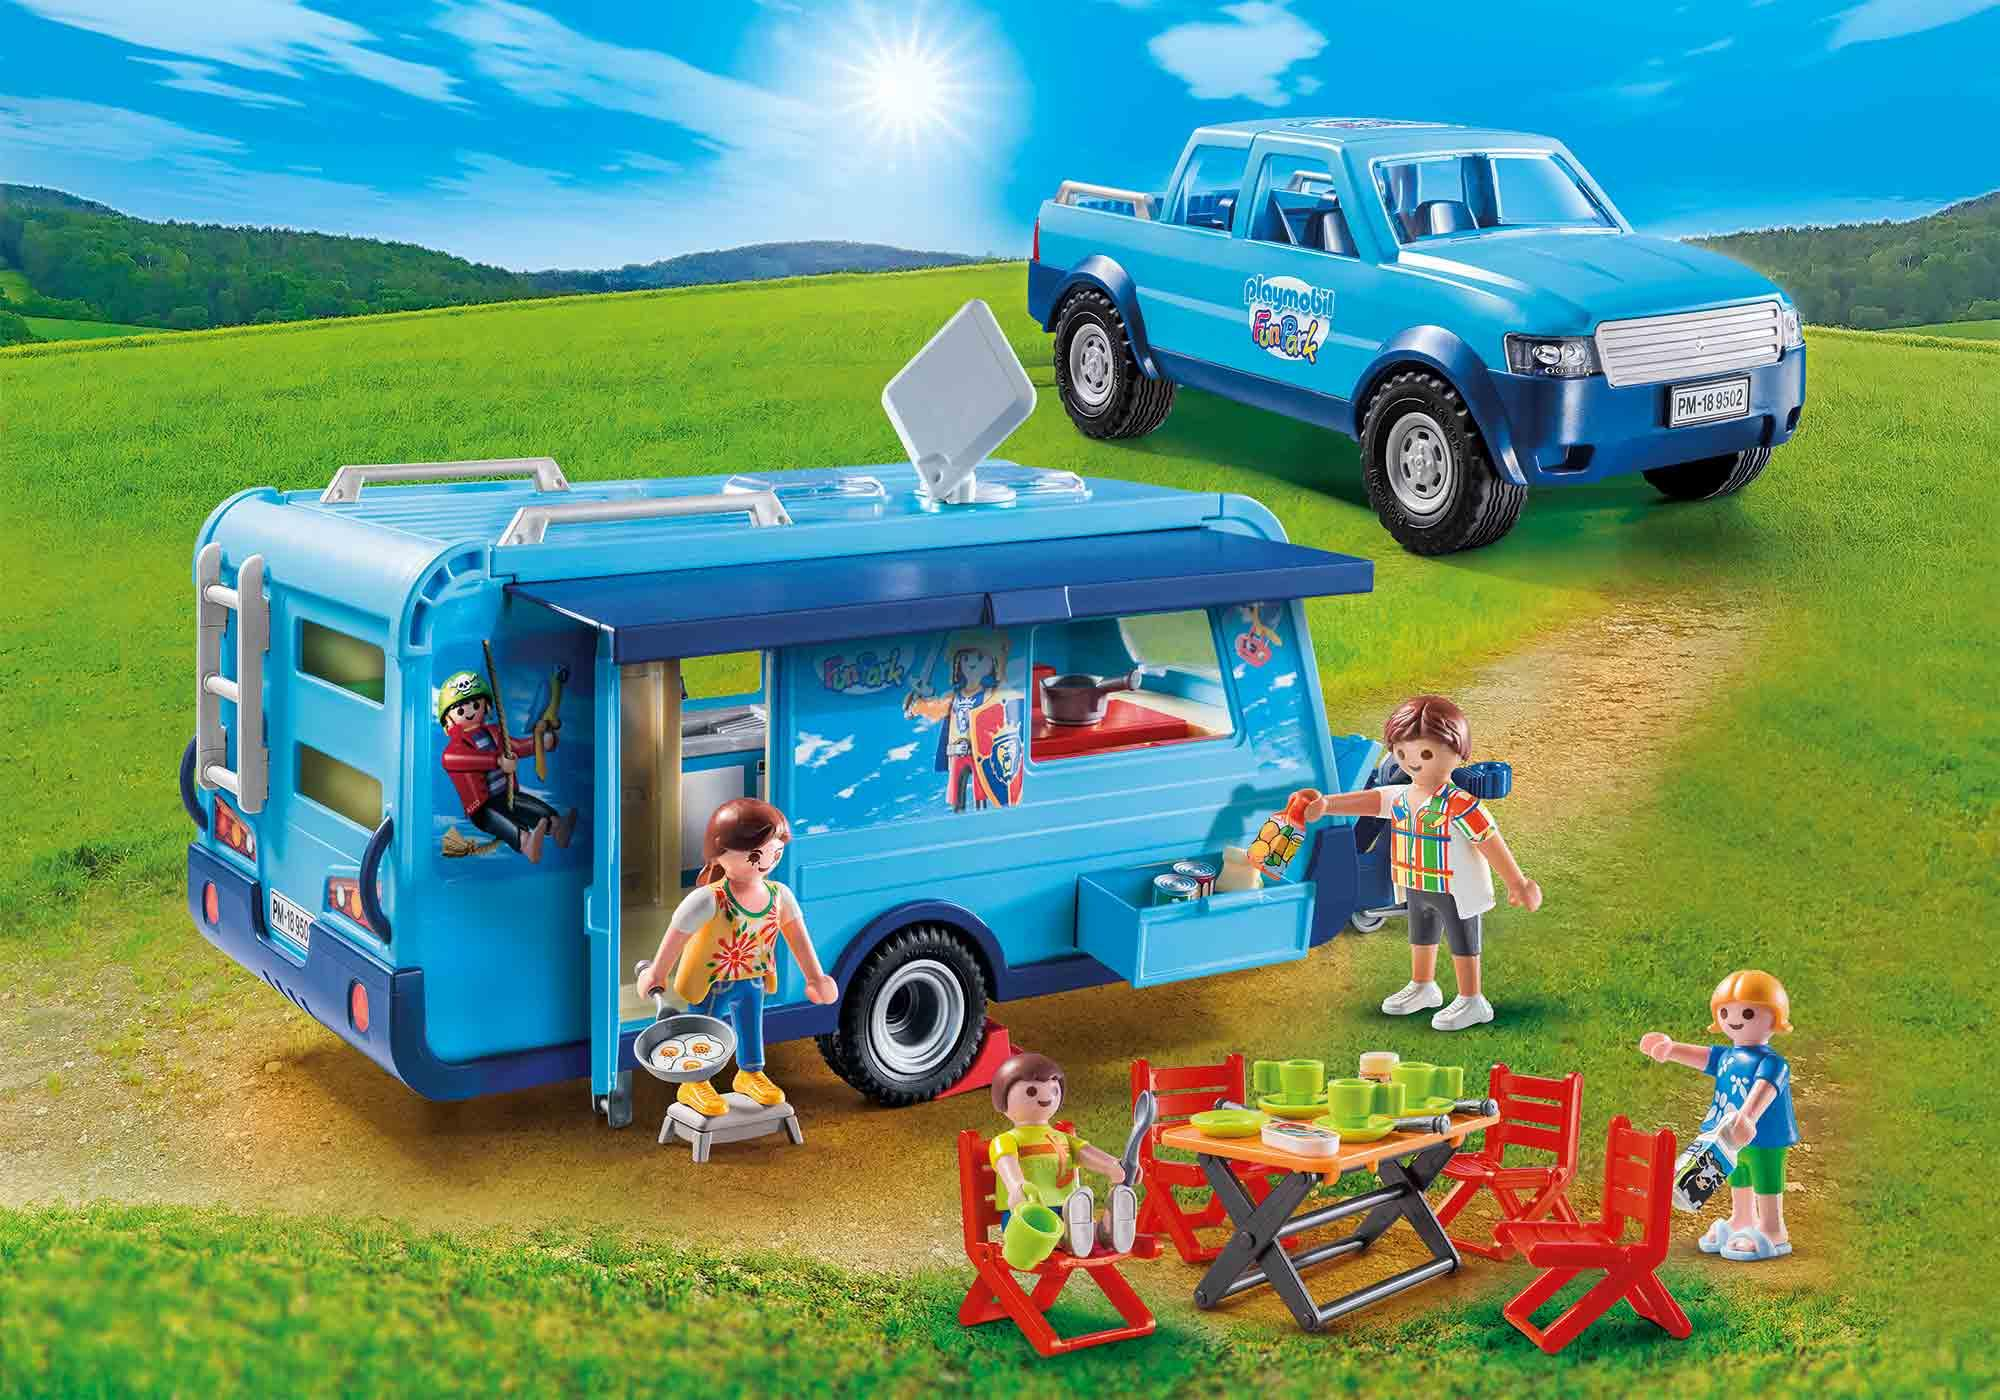 http://media.playmobil.com/i/playmobil/9502_product_detail/PLAYMOBIL-FunPark Pickup with Camper